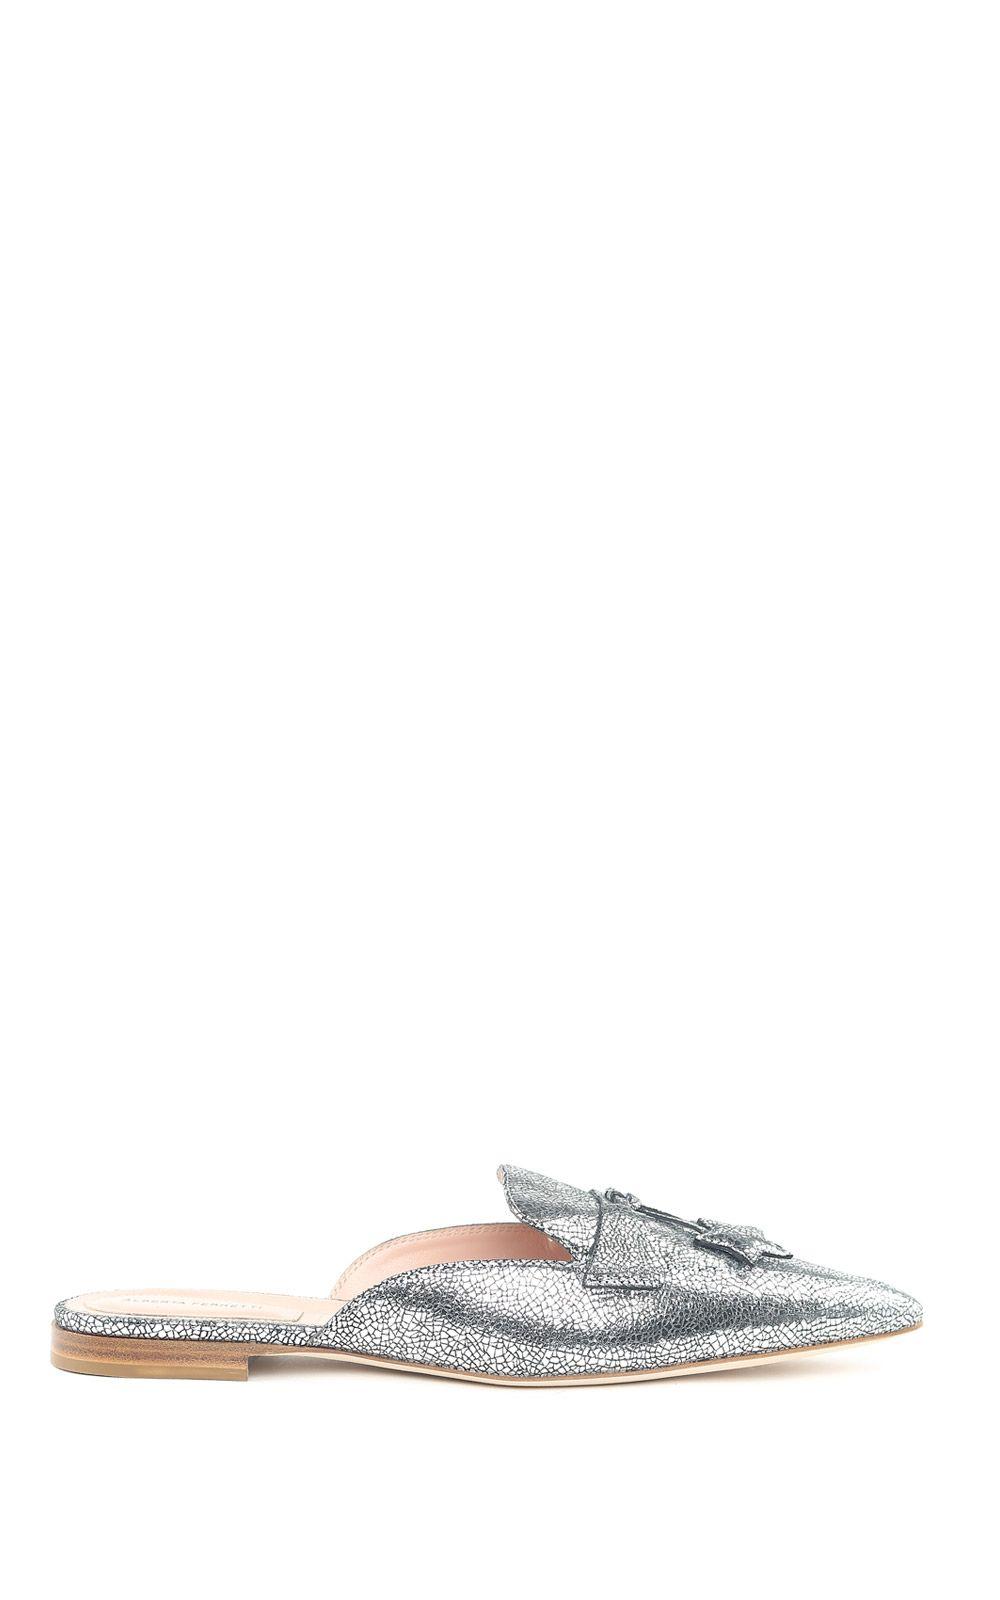 Mia metallic-leather backless loafers Alberta Ferretti zhASM